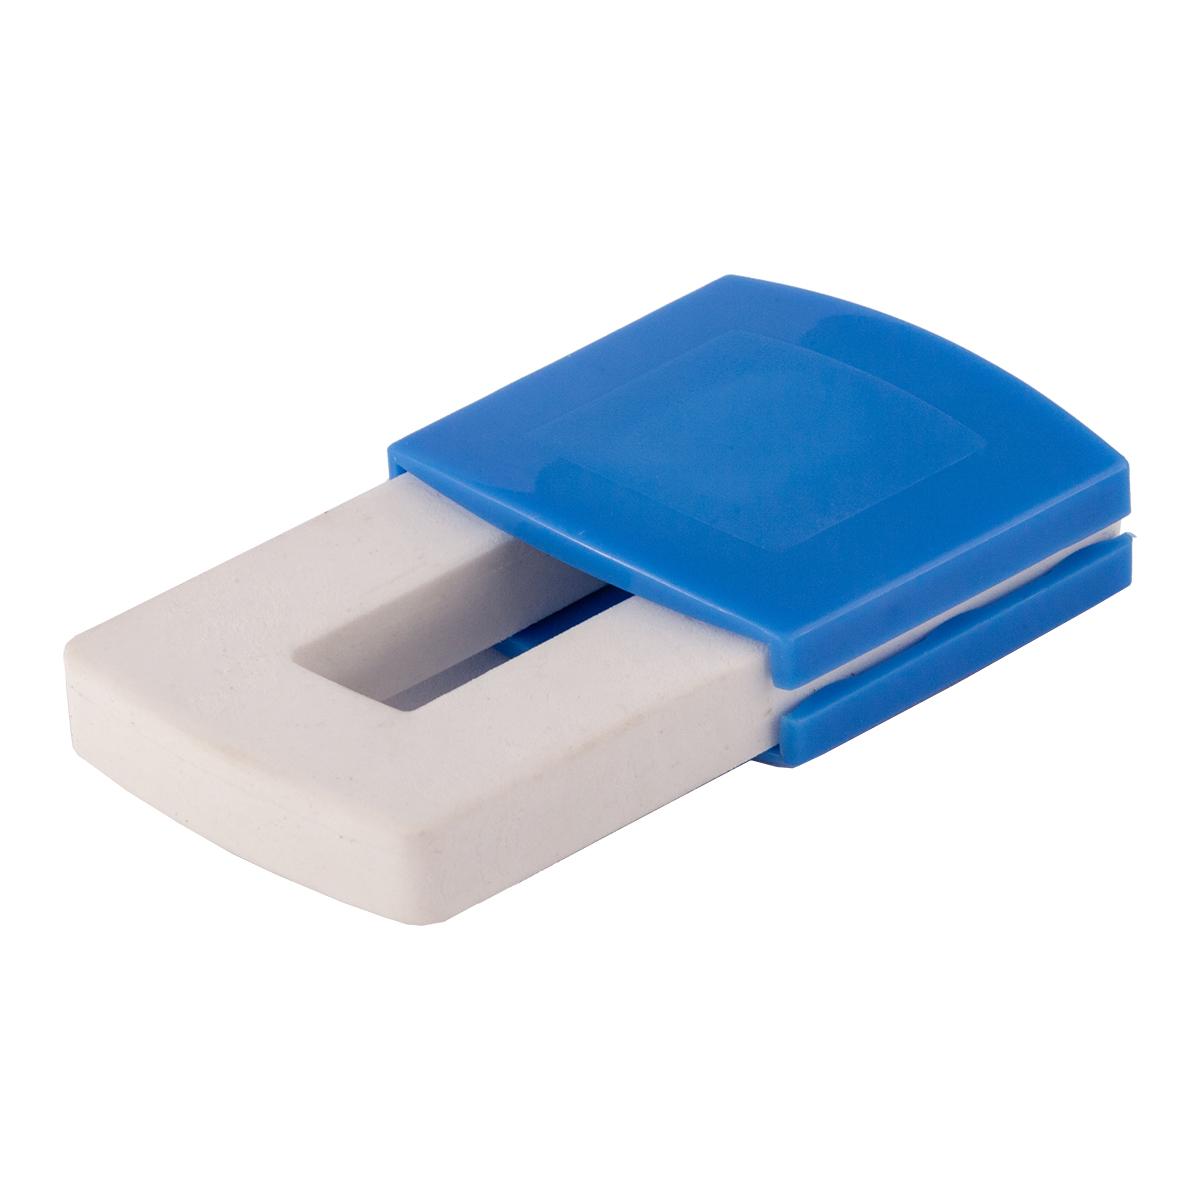 SLIDE rubber,  blue